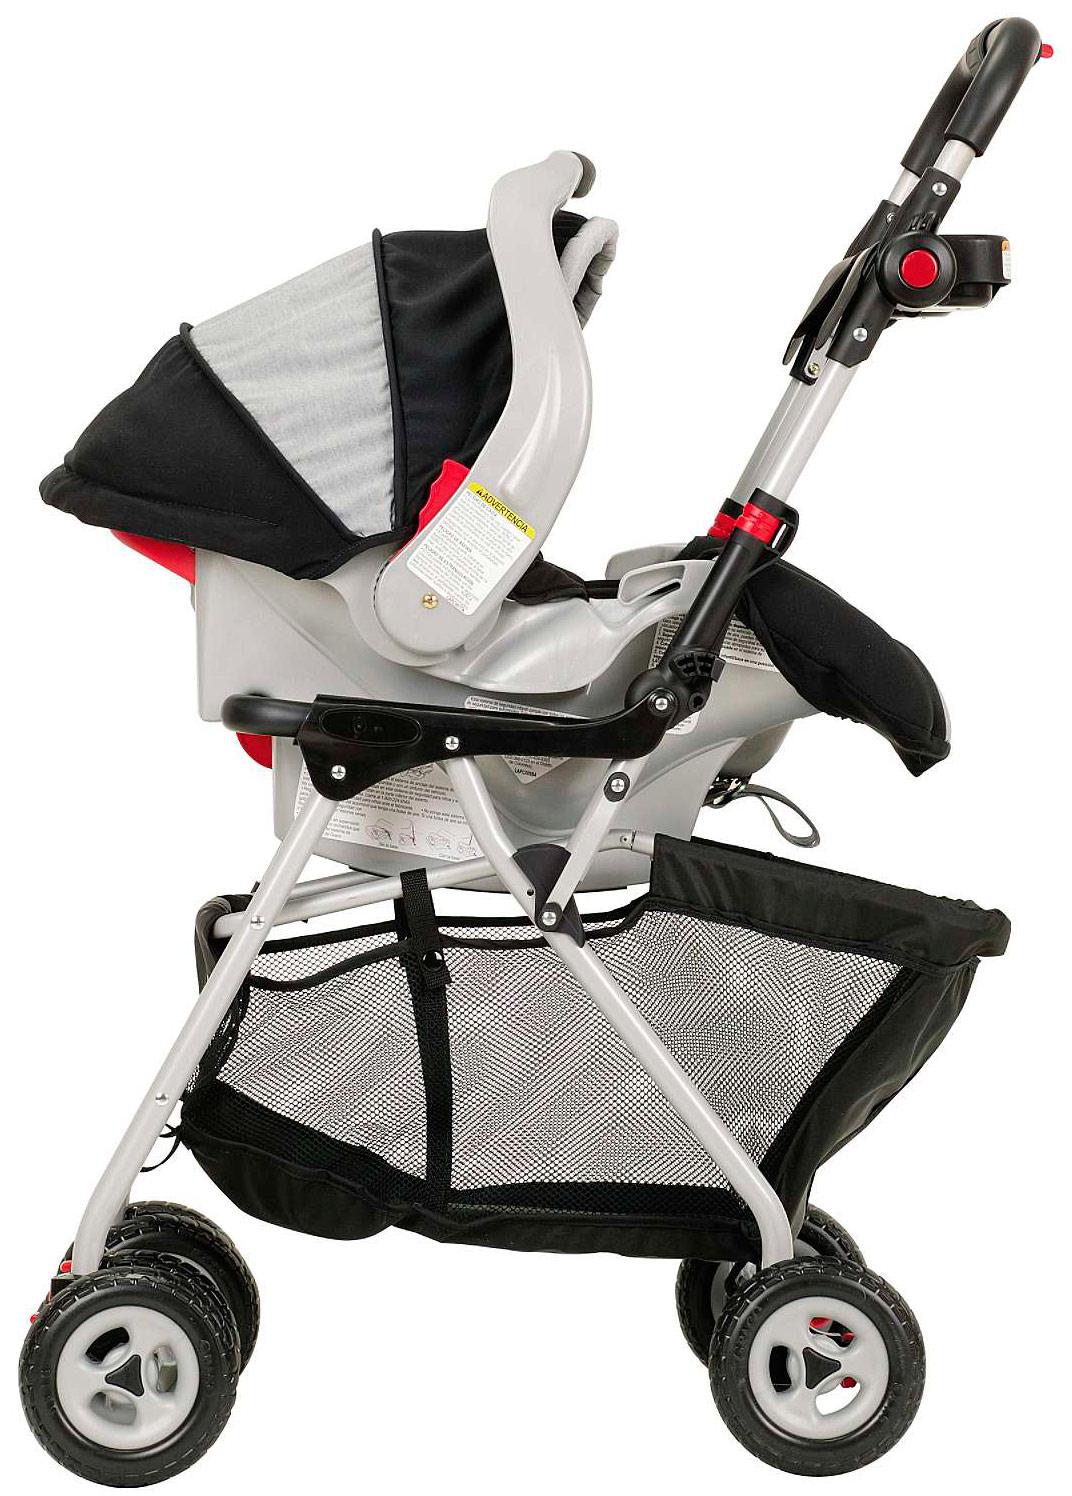 Car Seat Stroller - Best Strollers